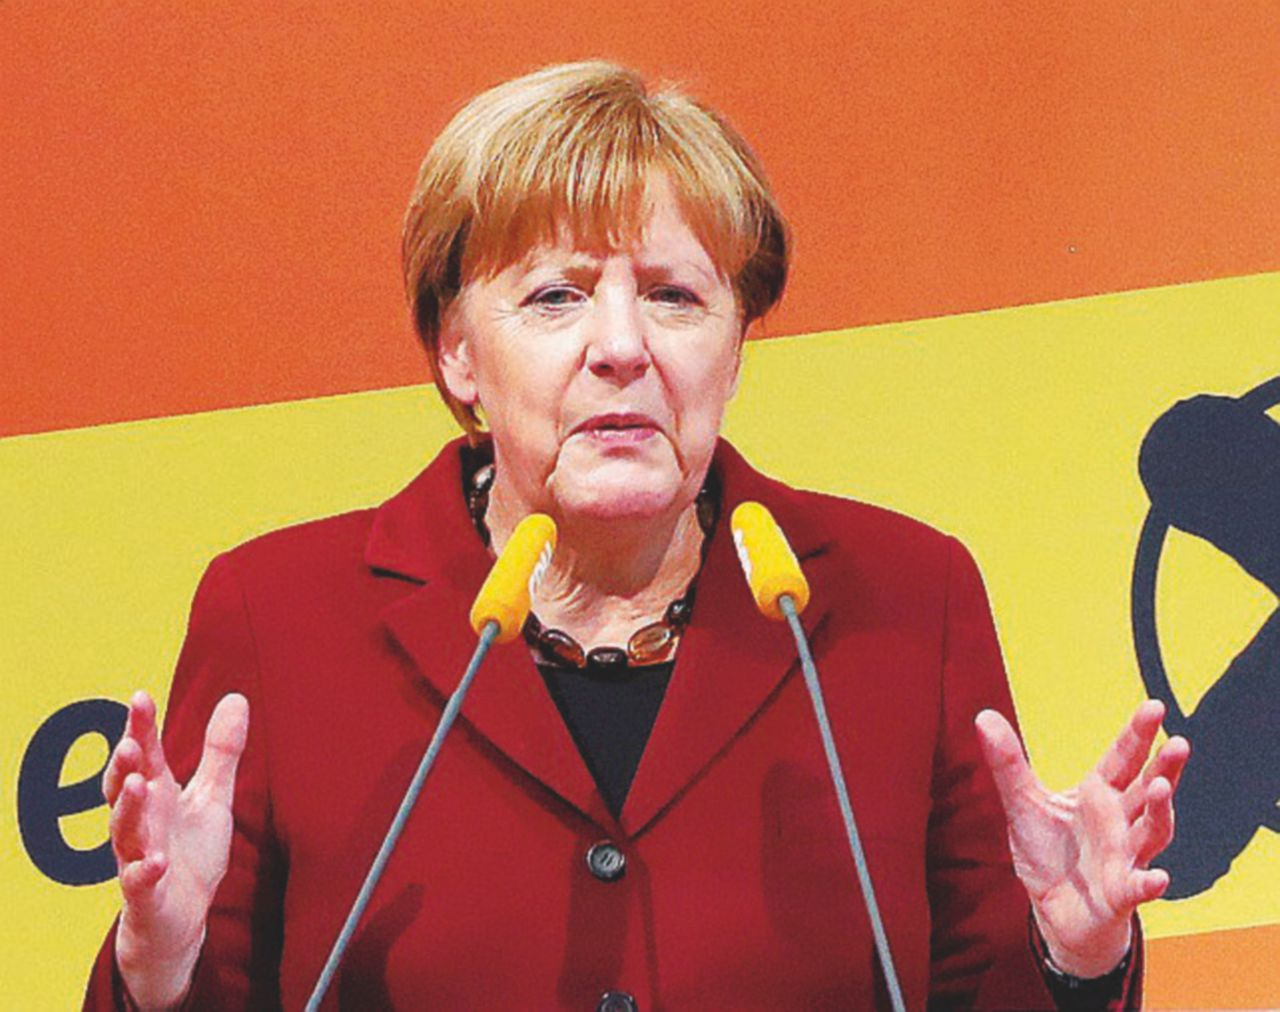 Germania, onda xenofoba contro Cdu e Spd